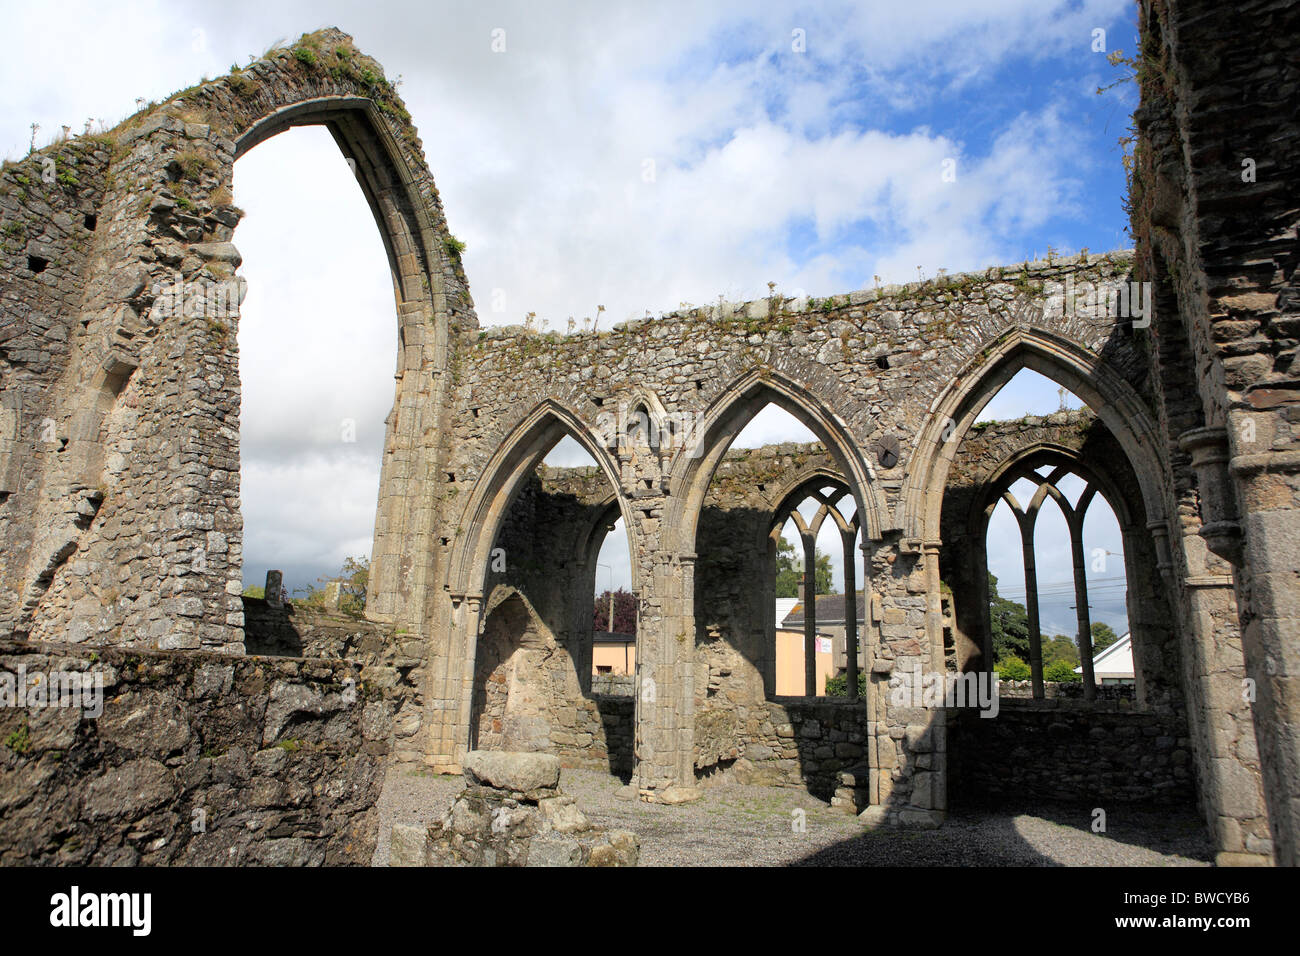 Franciscan abbey (14 century), Castledermot, Kildare county, Ireland - Stock Image